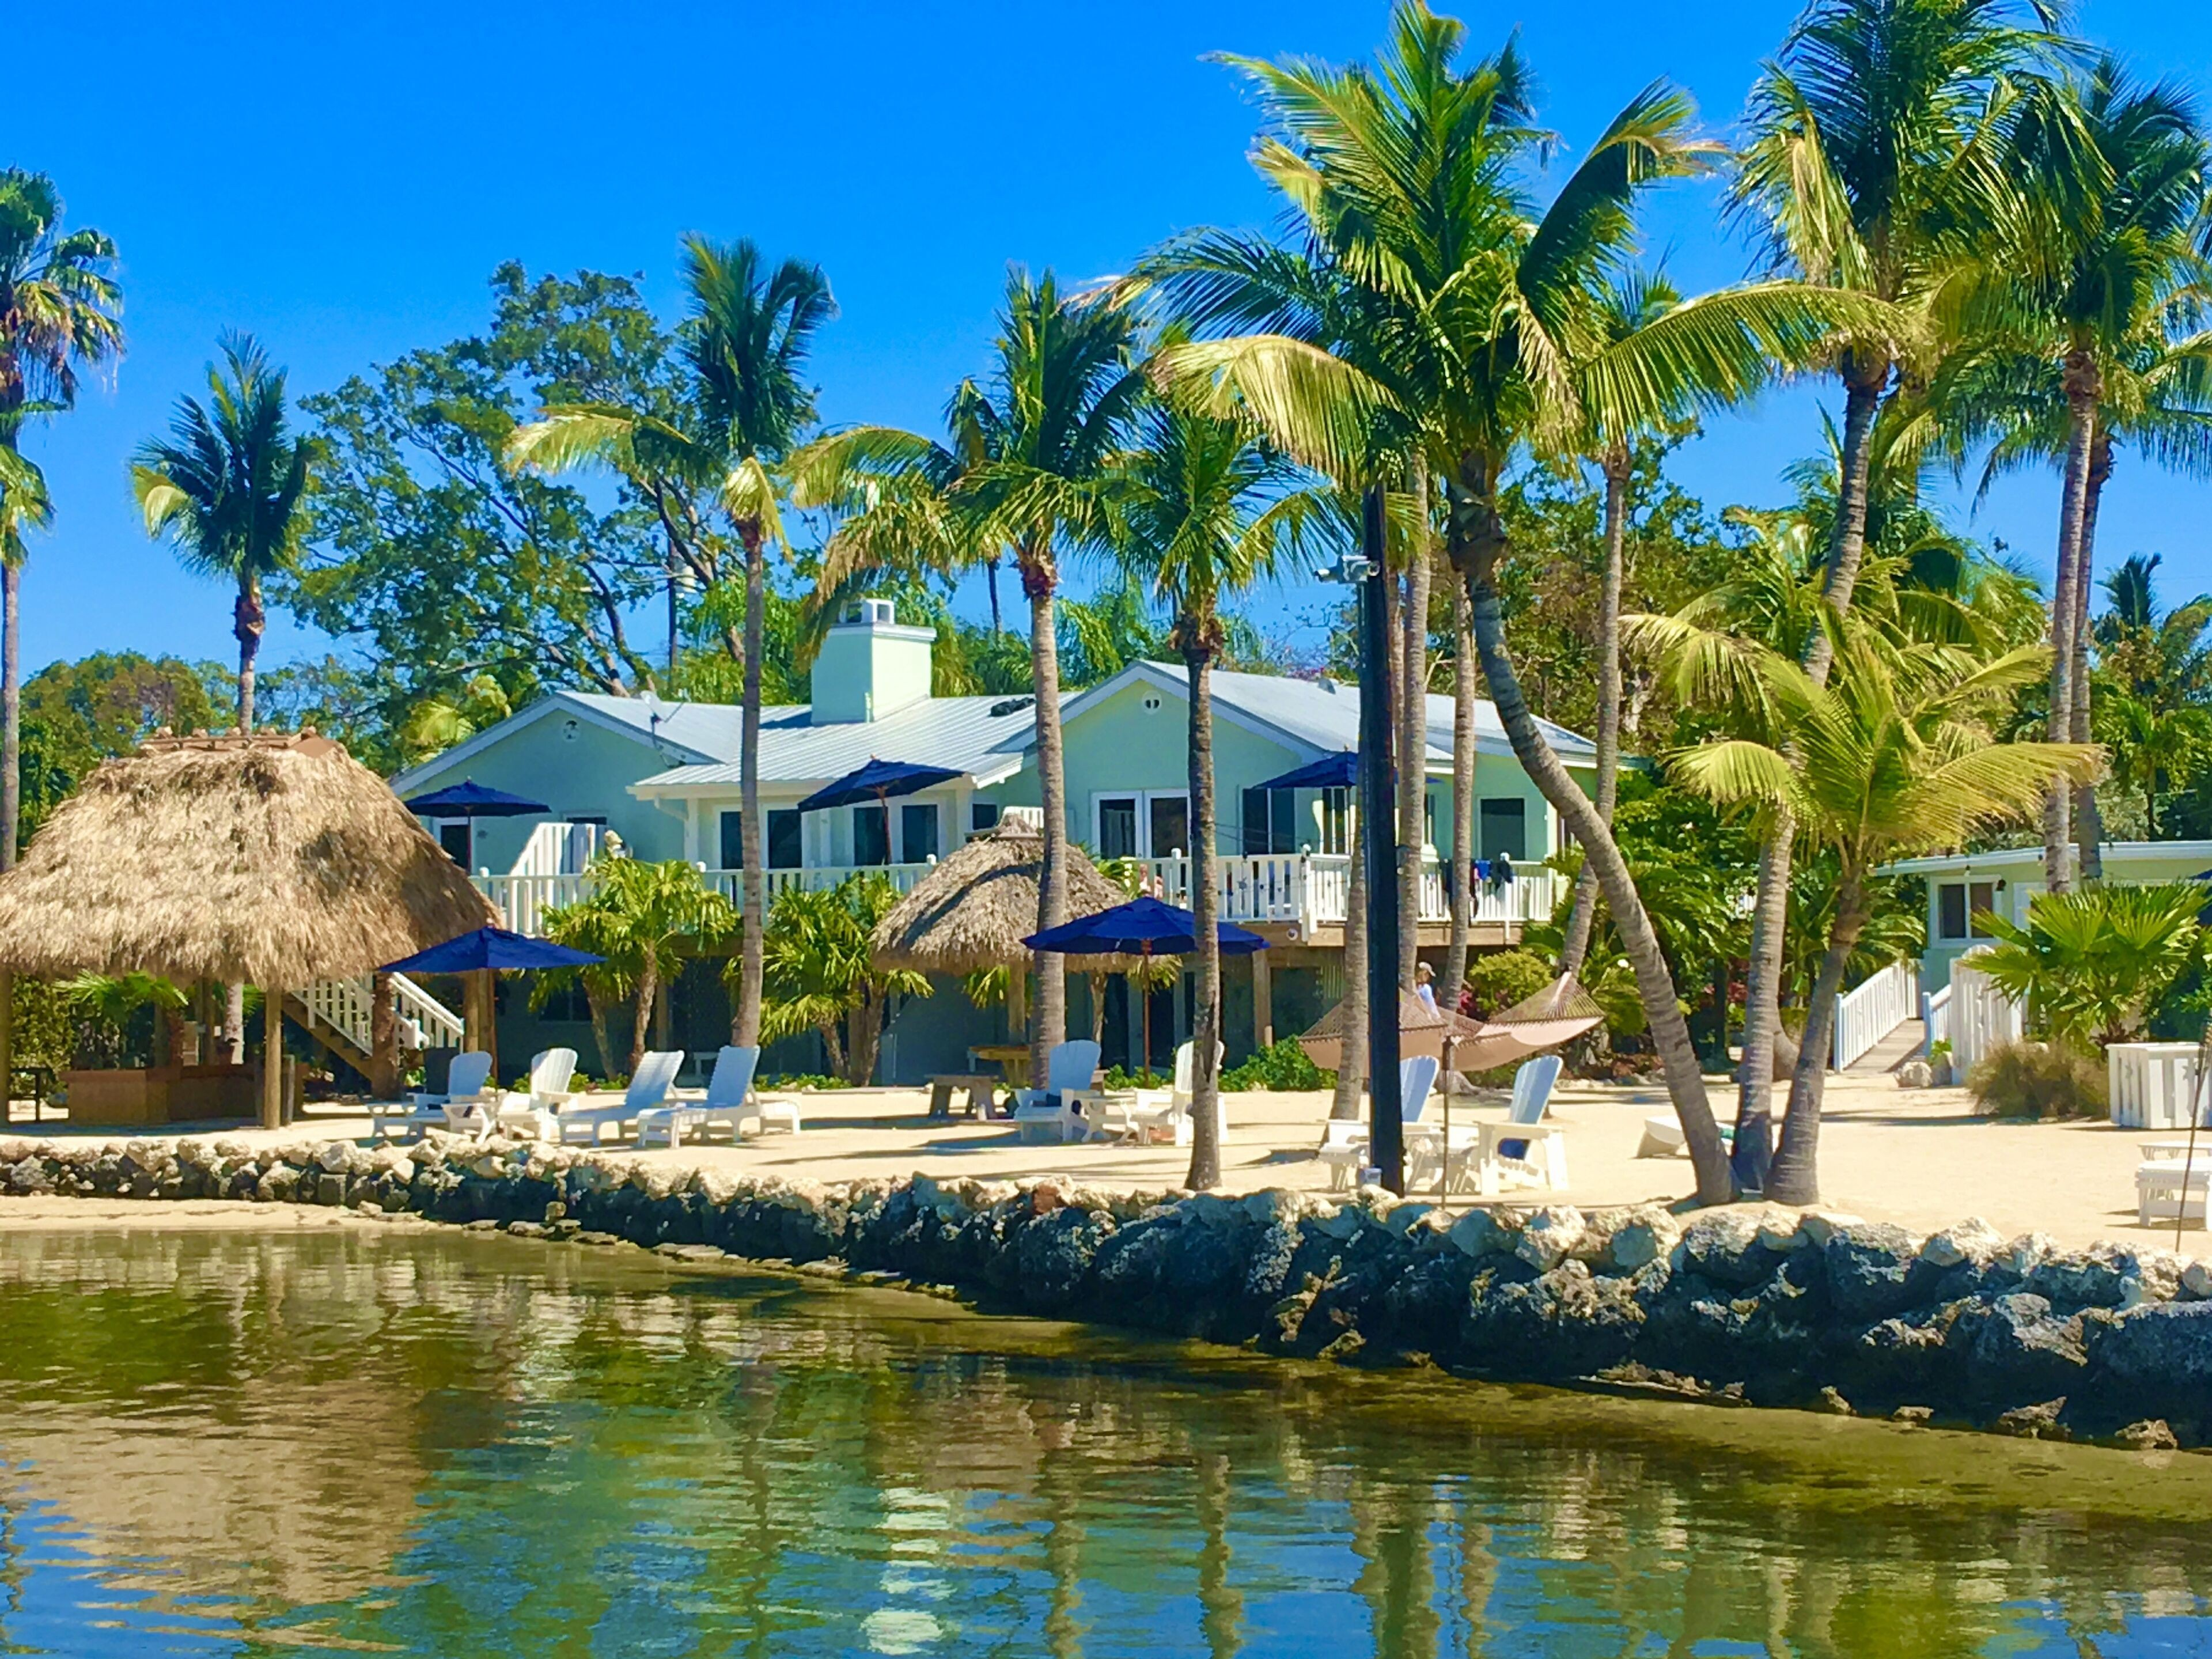 Courtesy of Coconut Palm Inn / Expedia